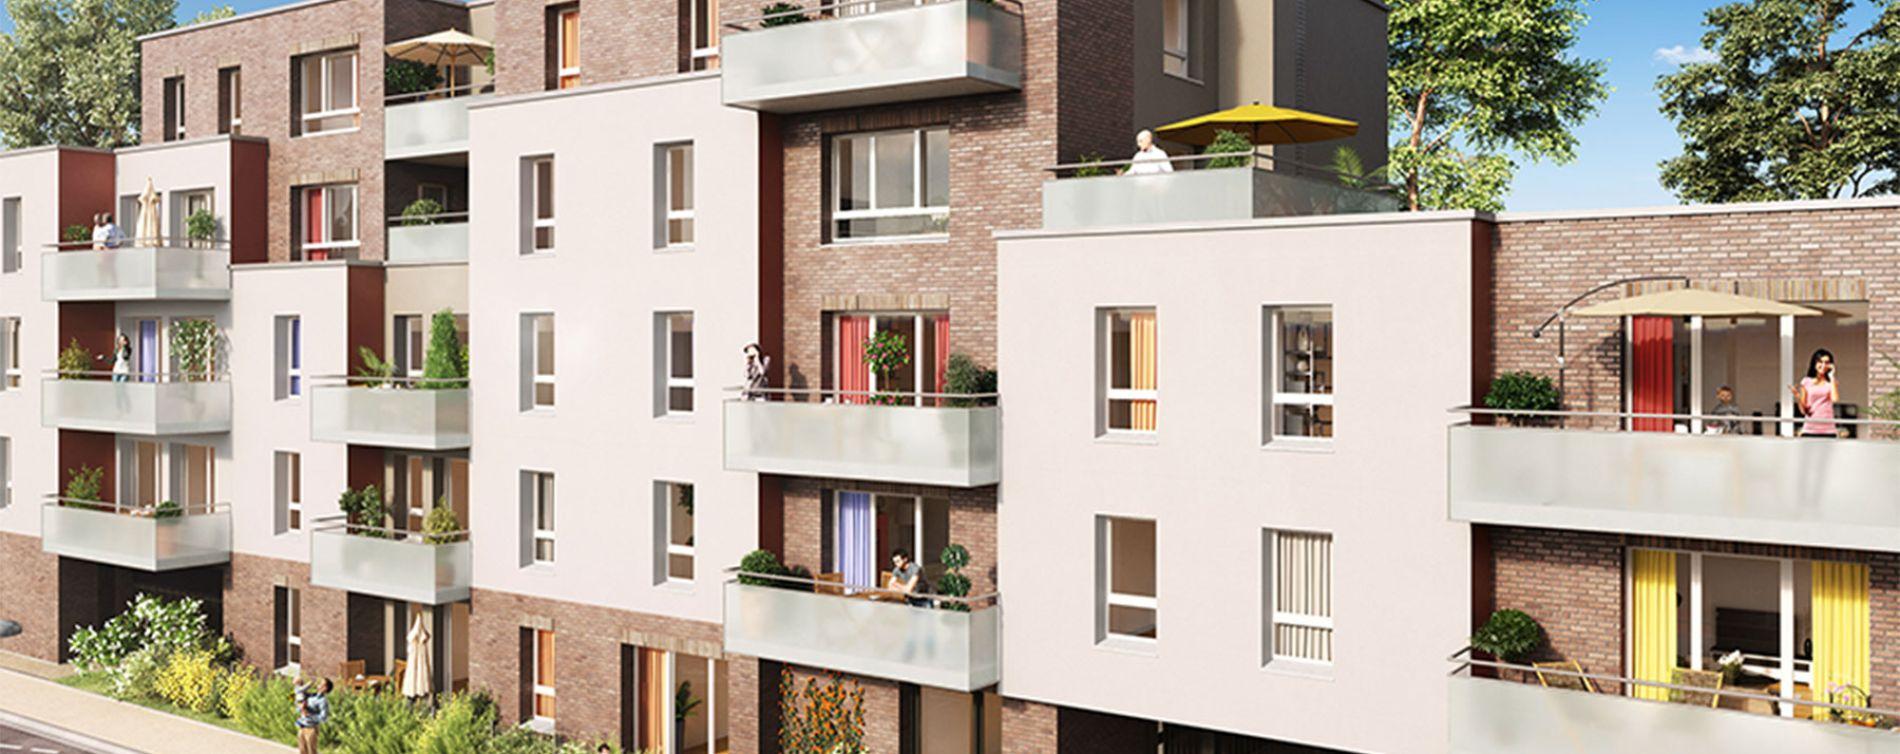 Ronchin : programme immobilier neuve « In Villam »